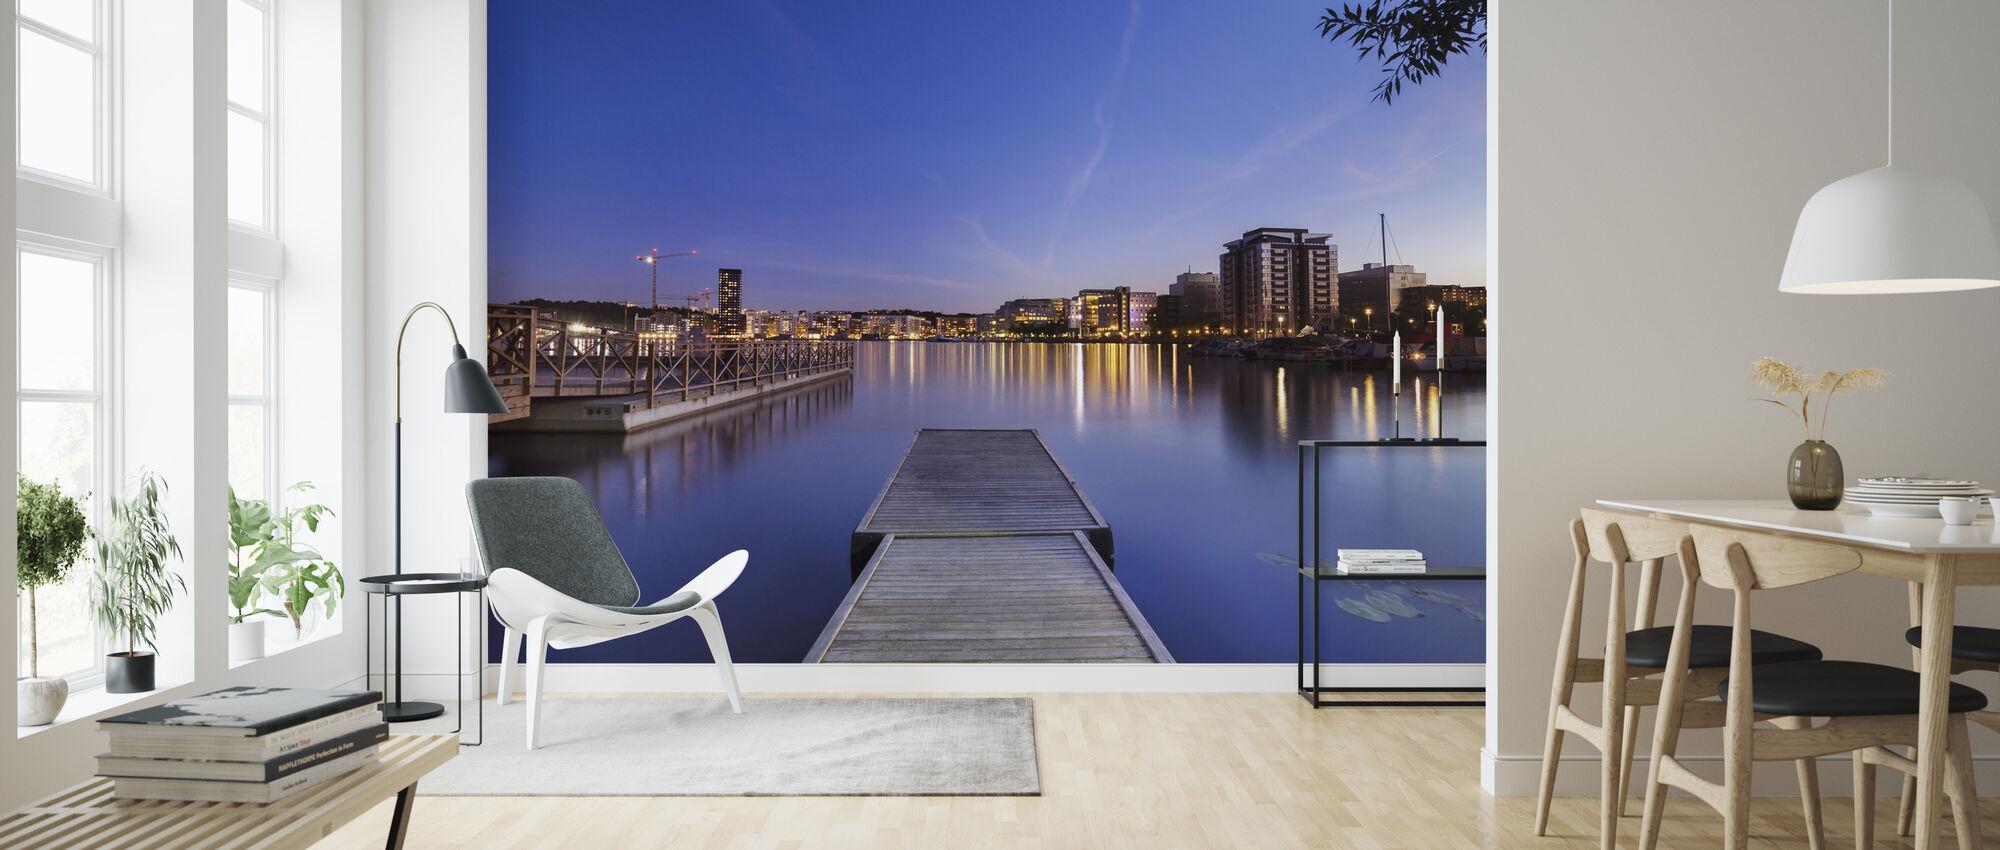 Tantogatan at Dusk - Wallpaper - Living Room